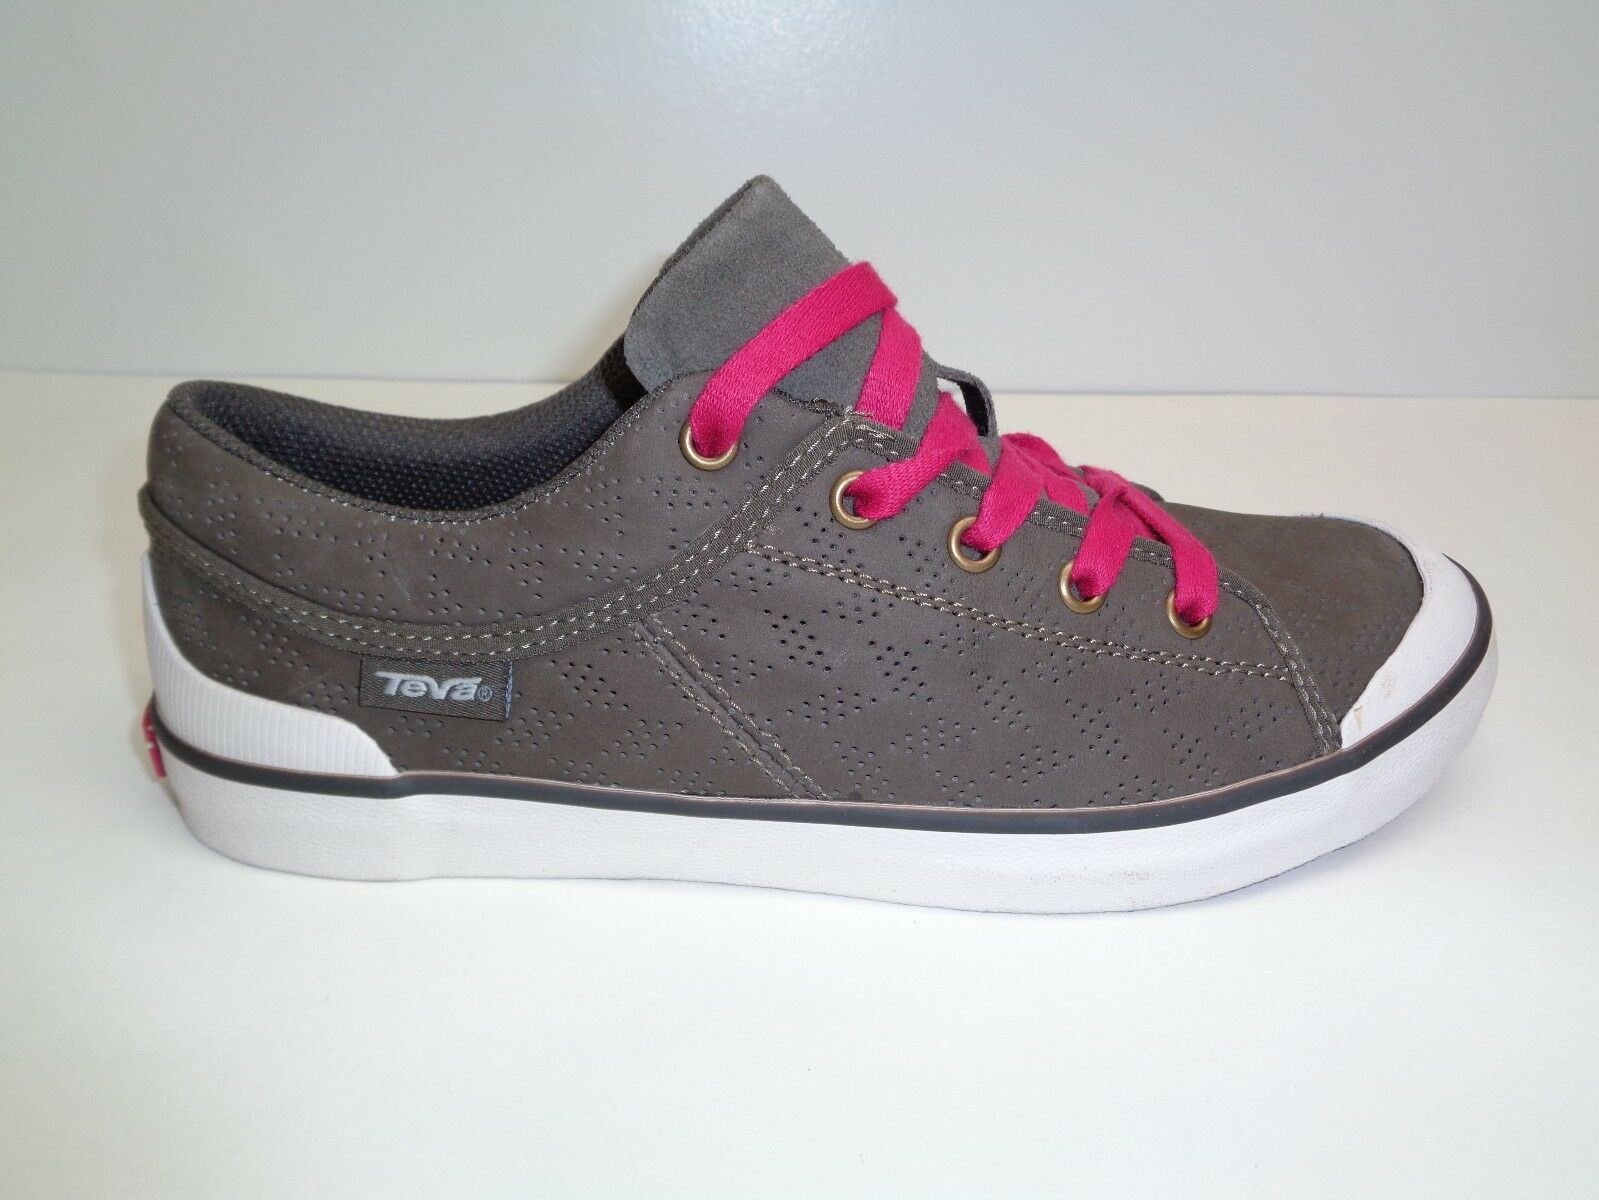 Teva Größe 8.5 FREEWHEEL PERFORATED Braun Leder Sneakers NEU Damenschuhe Schuhes